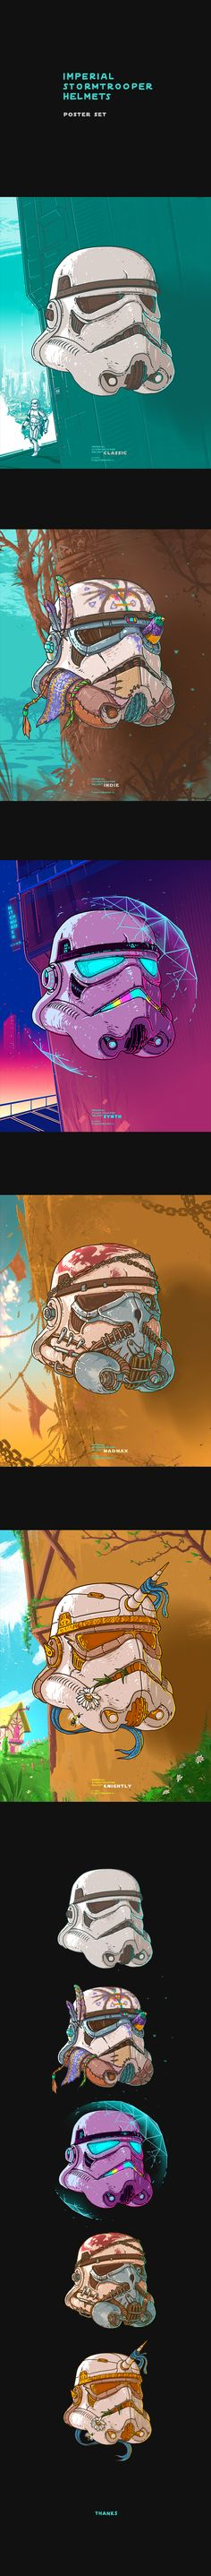 https://www.behance.net/gallery/26902687/Imperial-Stormtrooper-helmets-(poster-set)